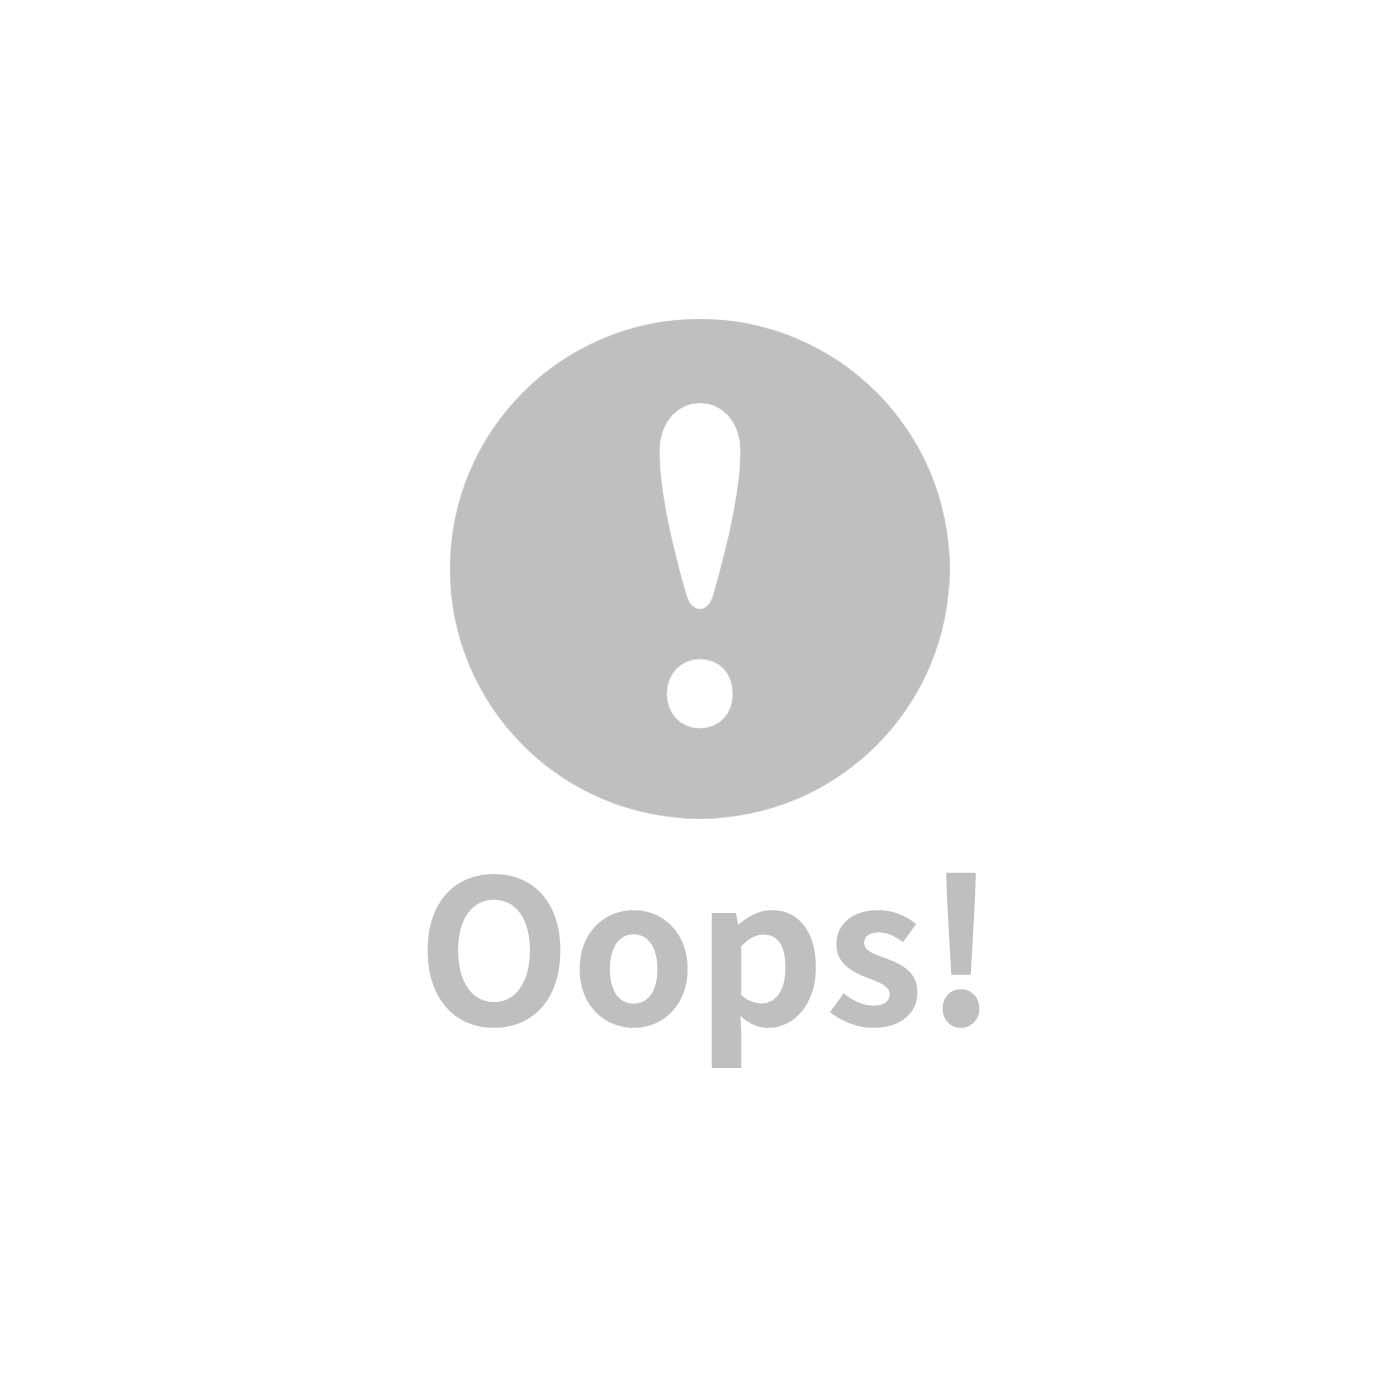 La Millou Moonies頂級羊皮膠底學步鞋禮盒11-18m_魔鬼氈款(焦糖)